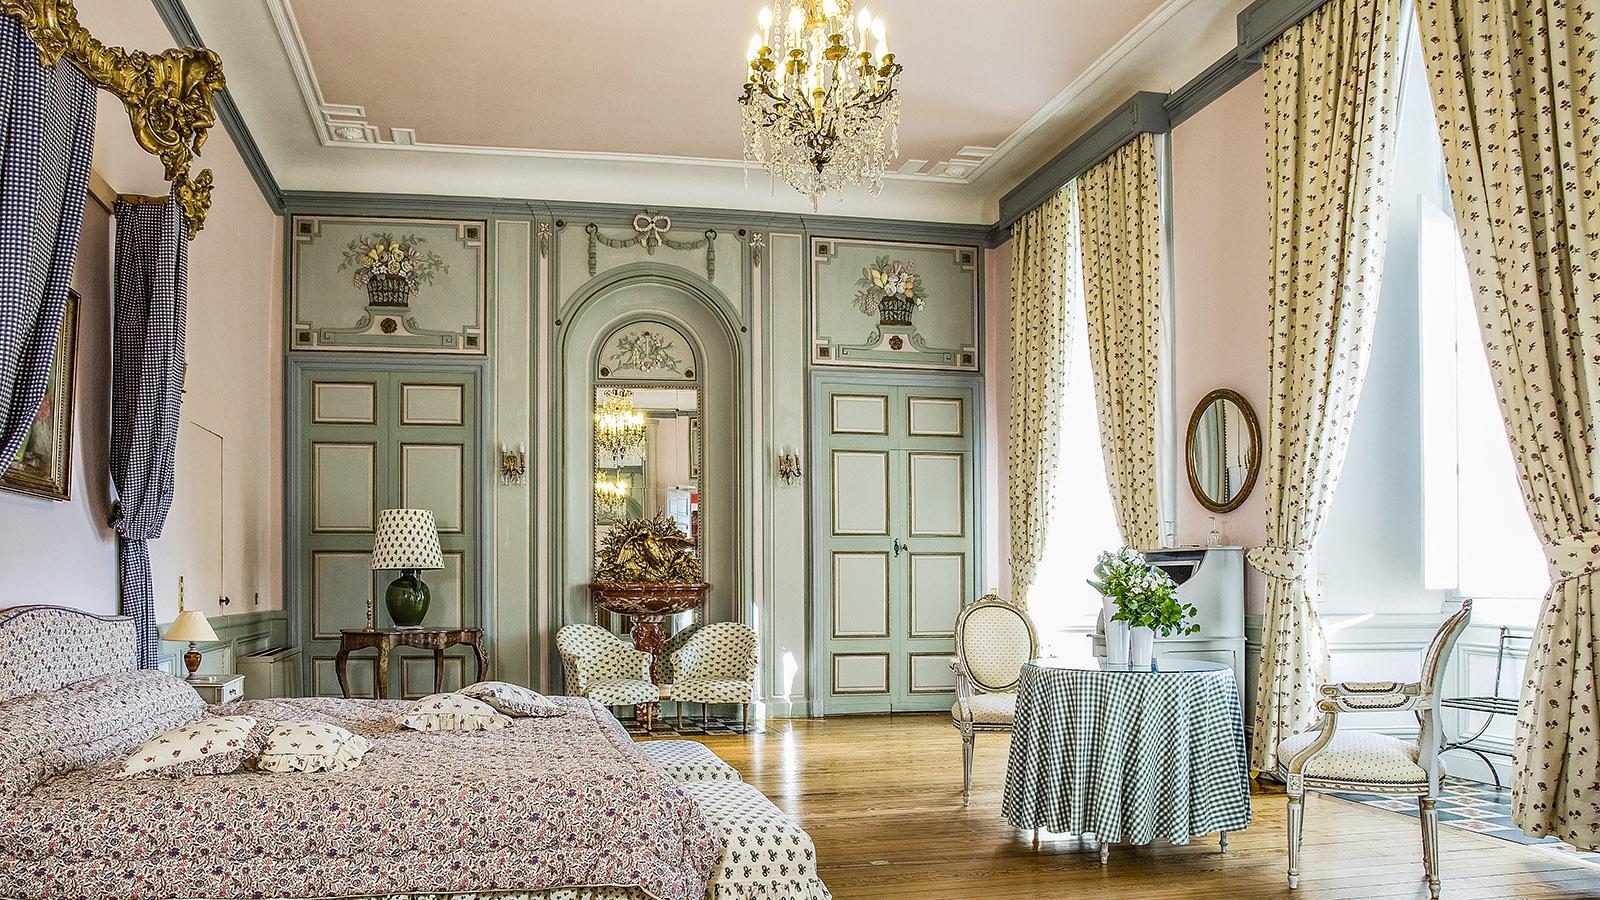 Rochegude: Château de Rochegude, Zimmer. Foto: Hilke Maunder